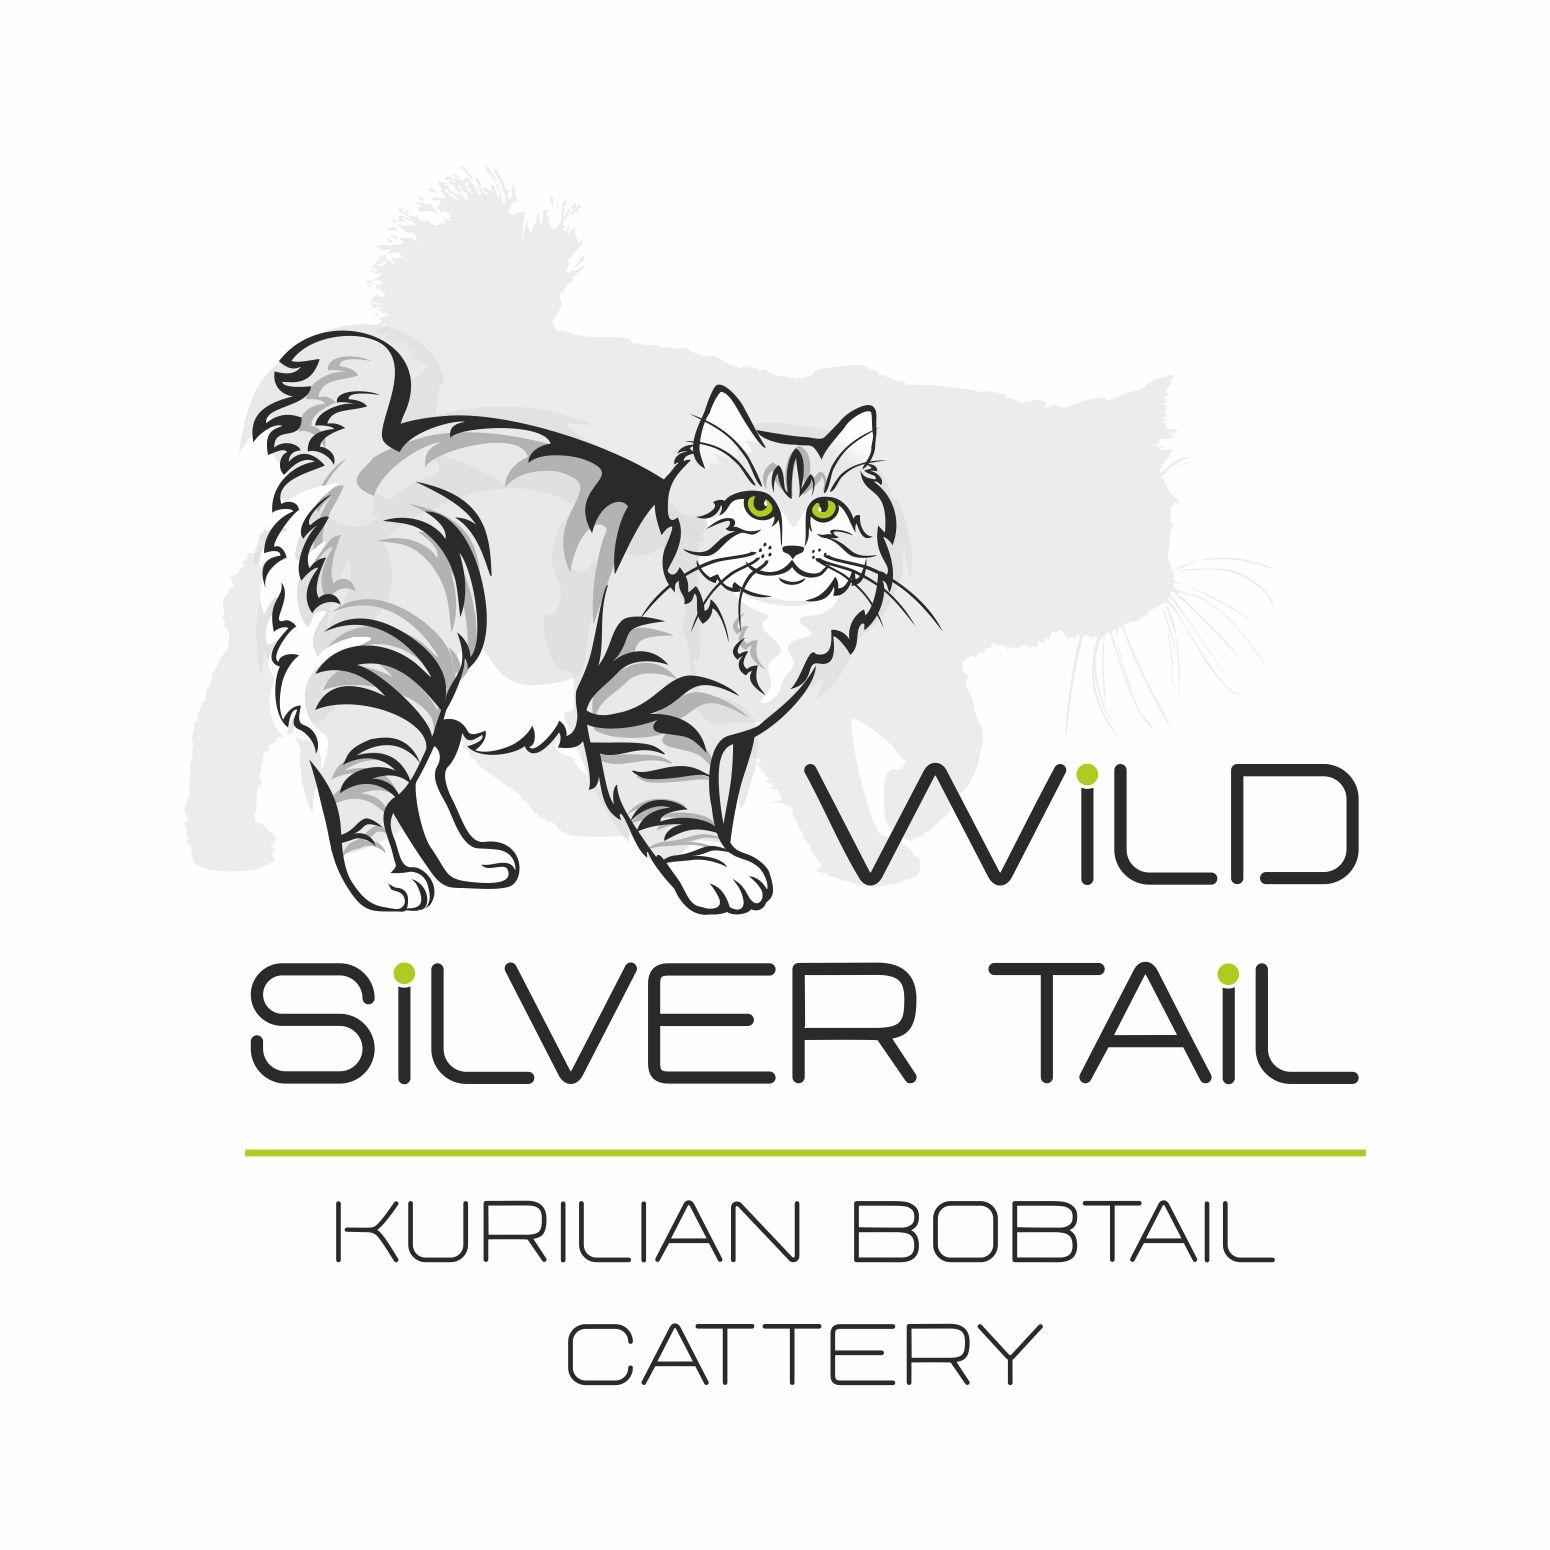 Wild Silver Tail Питомник курильских бобтейлов